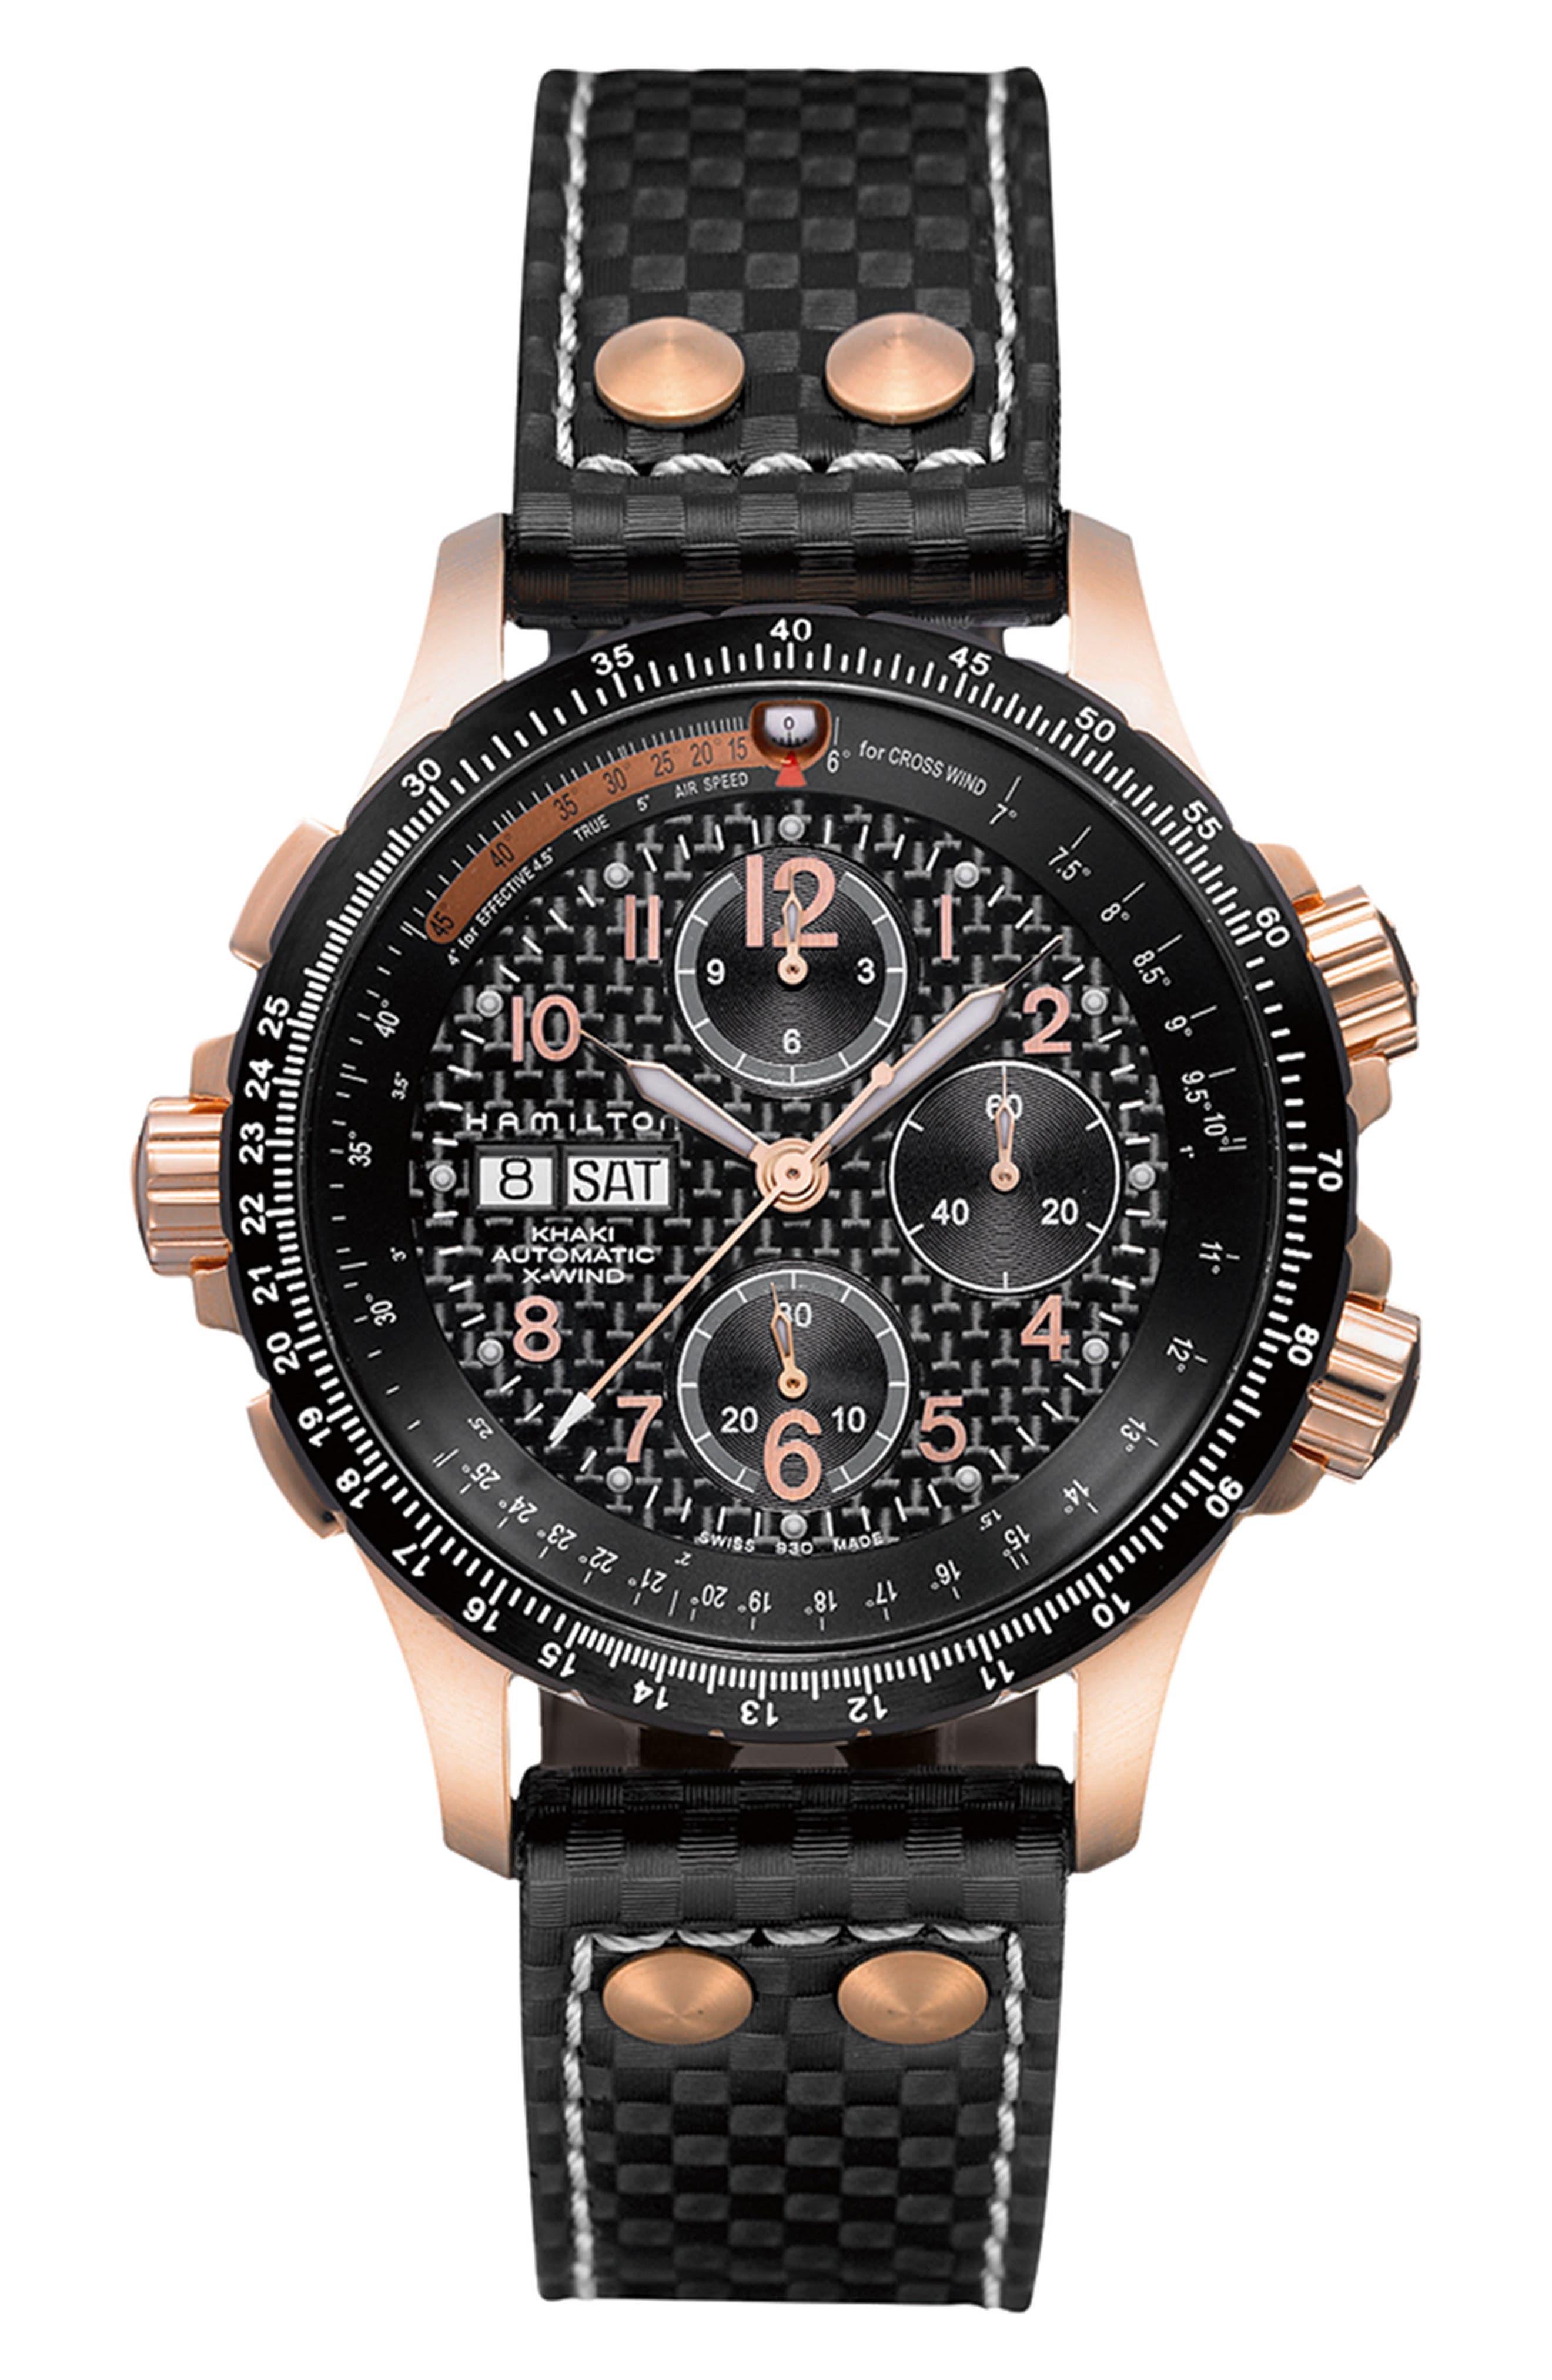 HAMILTON, Khaki X-Wind Automatic Chronograph Leather Strap Watch, 44mm, Main thumbnail 1, color, BLACK/ ROSE GOLD